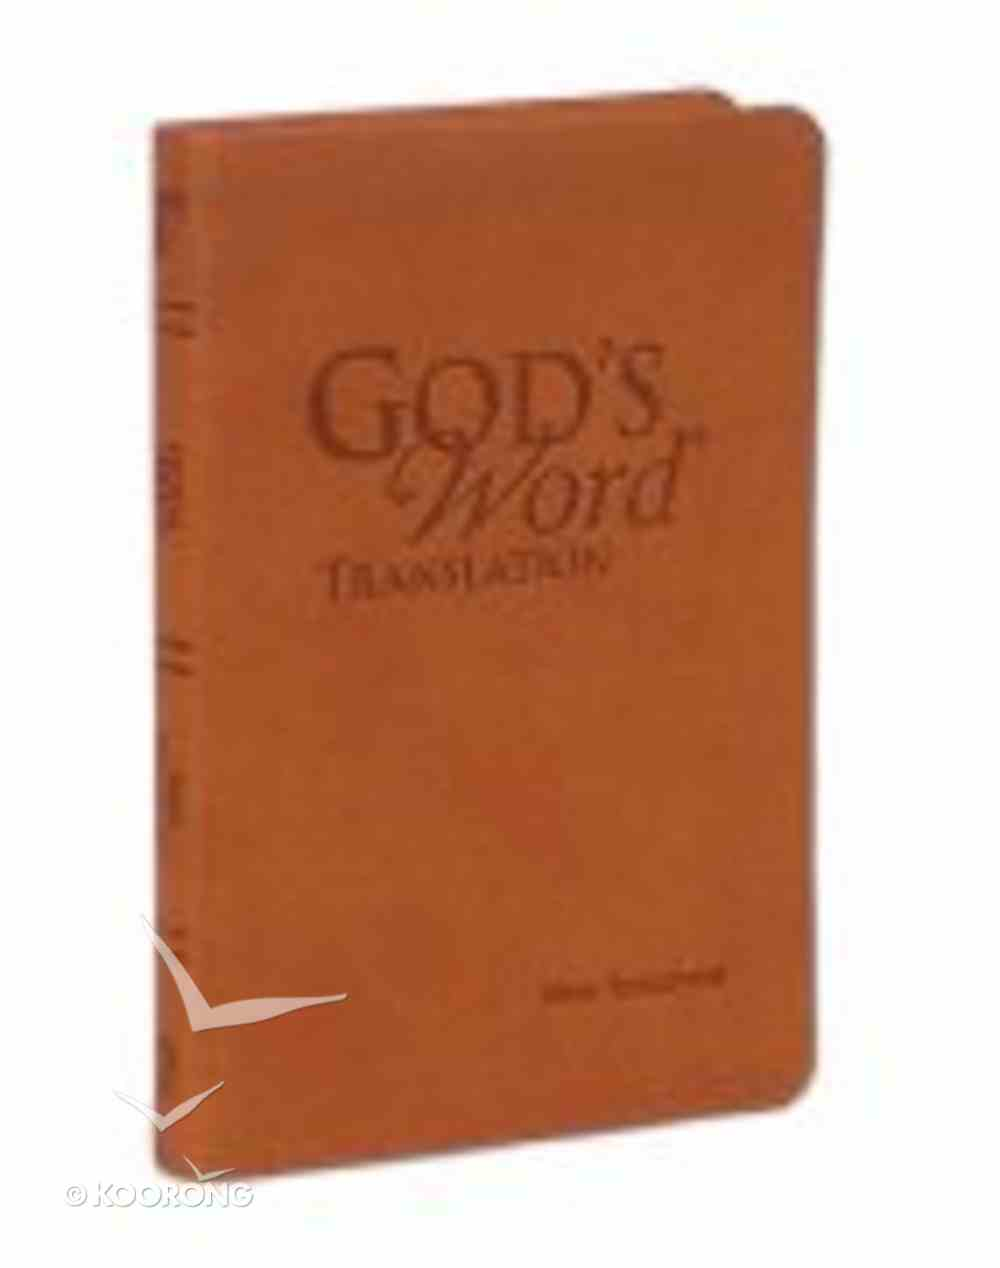 God's Word Pocket New Testament Saddle Imitation Leather